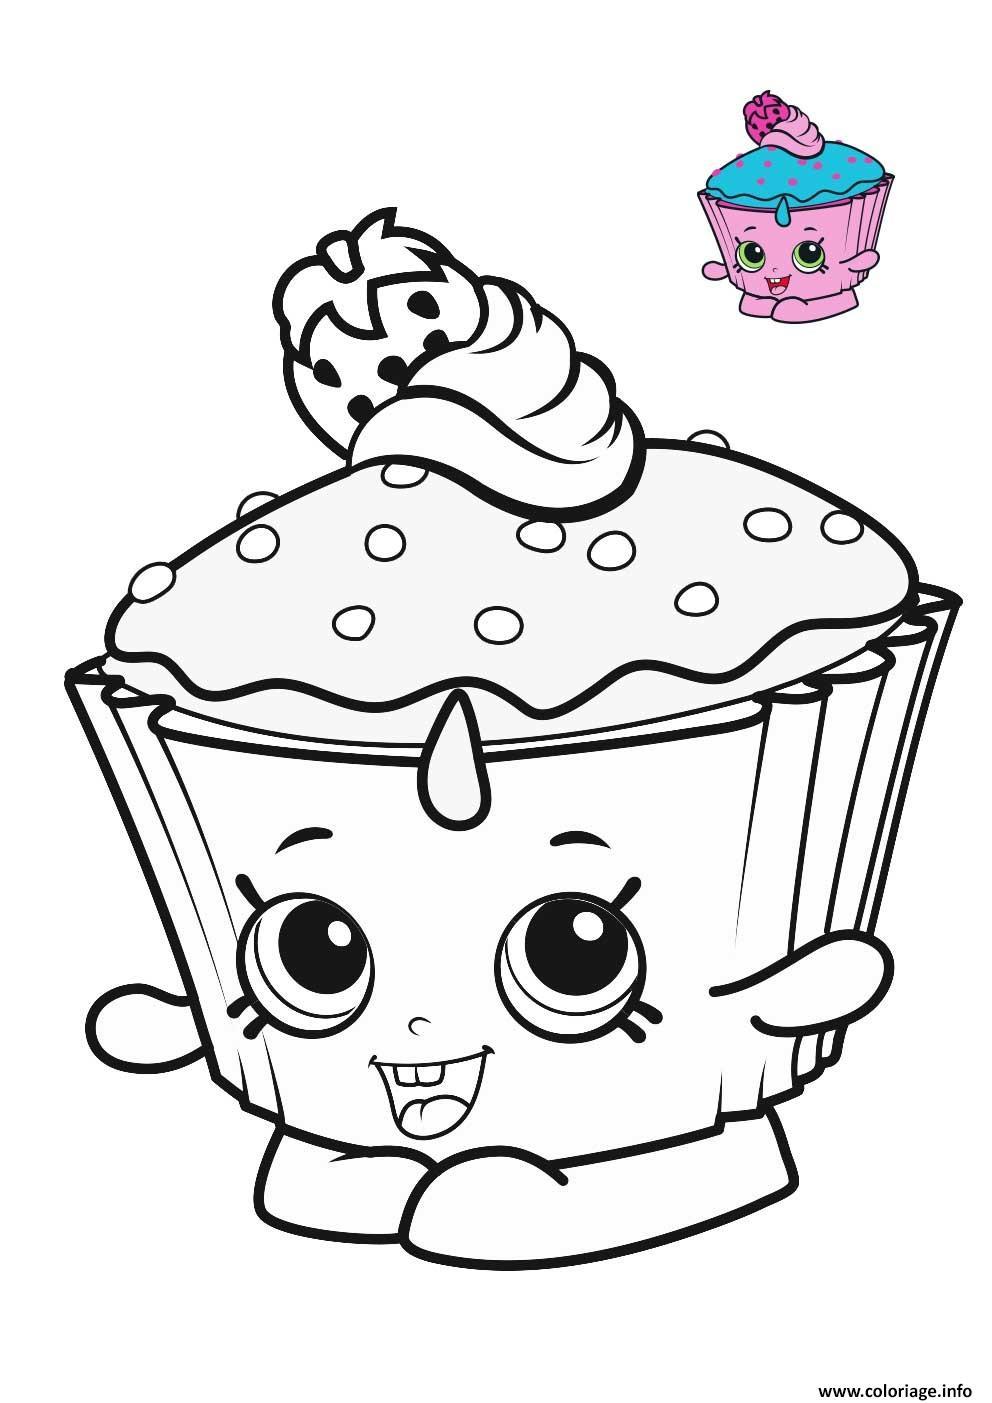 Coloriage shopkins cupcake blue pink dessin - Dessin cupcake ...